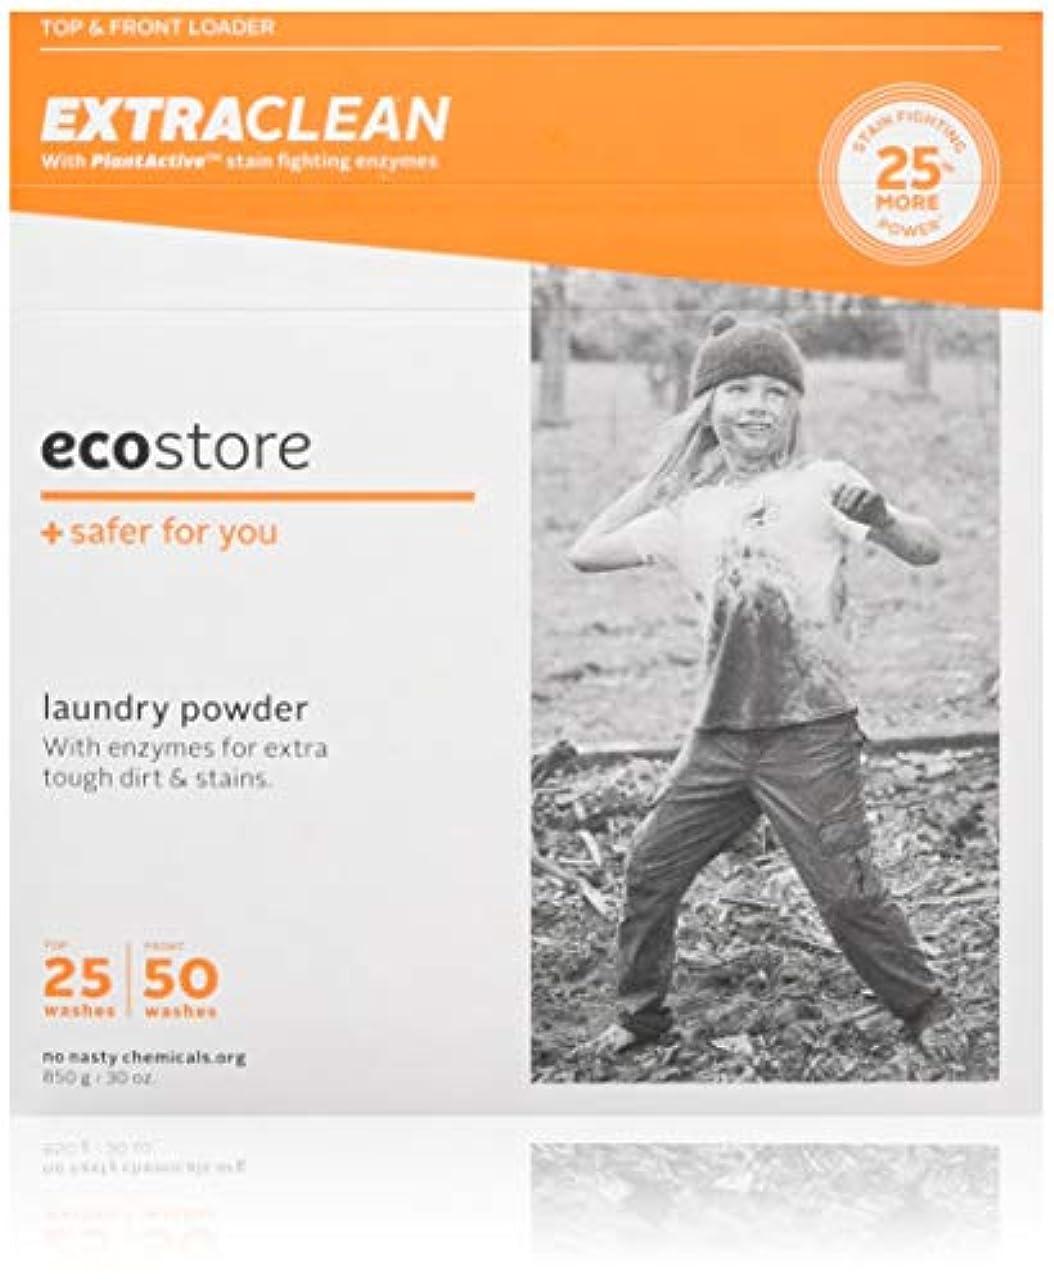 ecostore エコストア ランドリーパウダー 【エクストラクリーン 】 850g 汚れ落とし 洗濯 洗剤